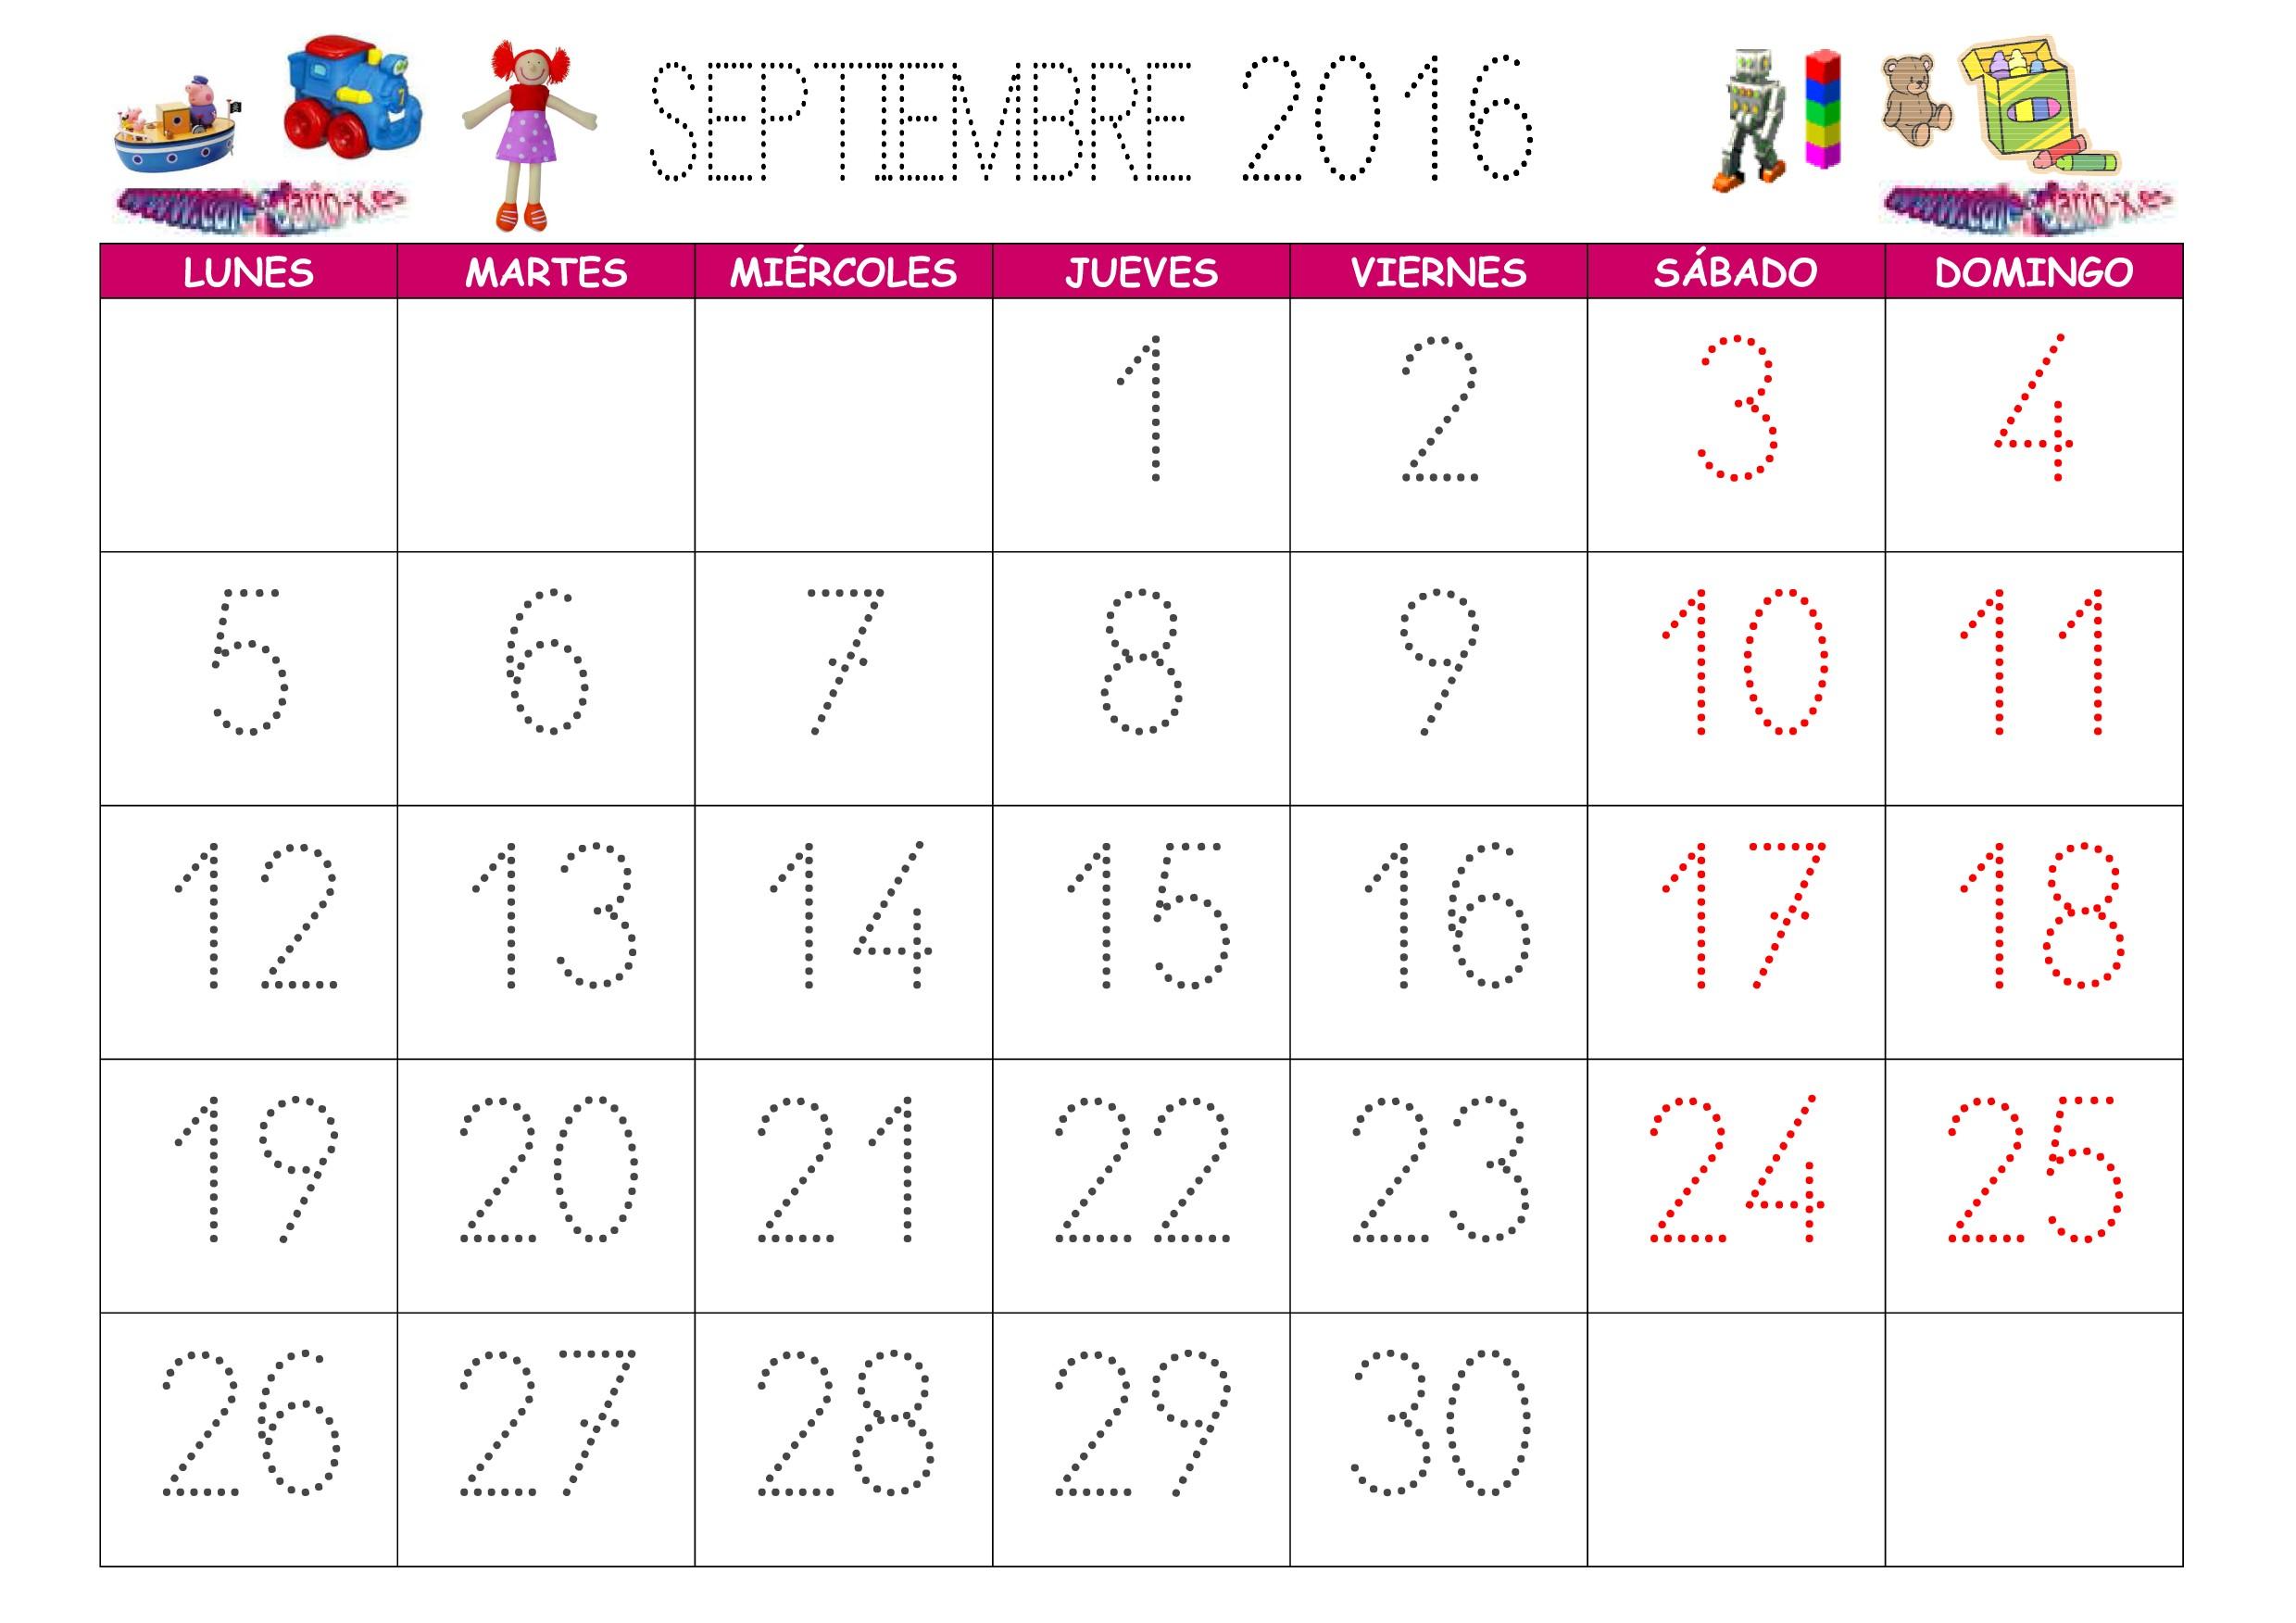 calendario para imprimir septiembre 2016 Calendarios Para Imprimir